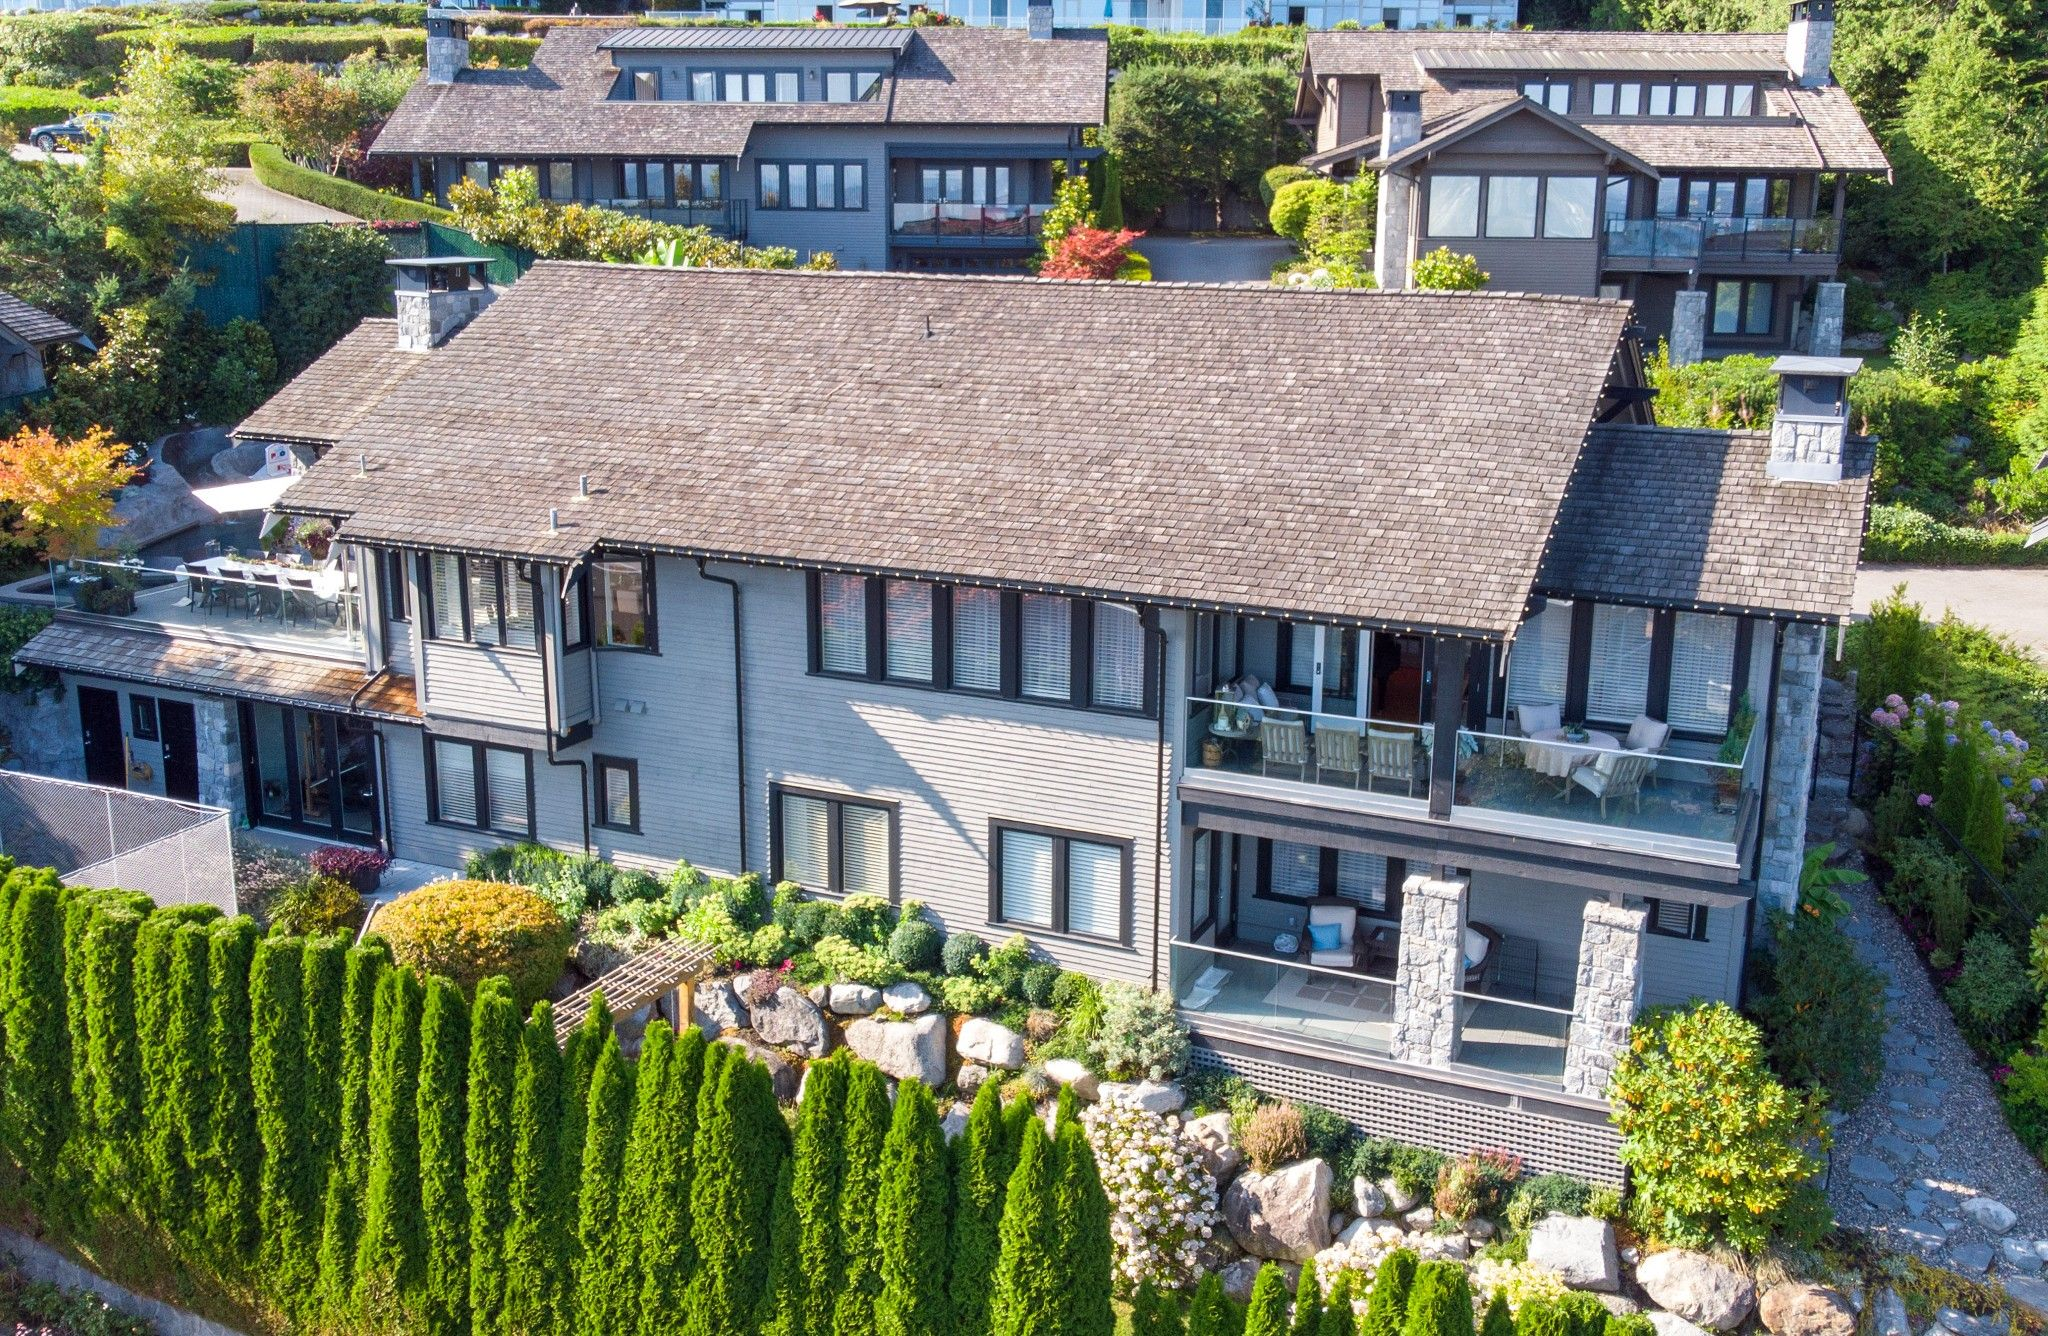 Main Photo: 2236 BOULDER COURT: House for sale : MLS®# R2400285